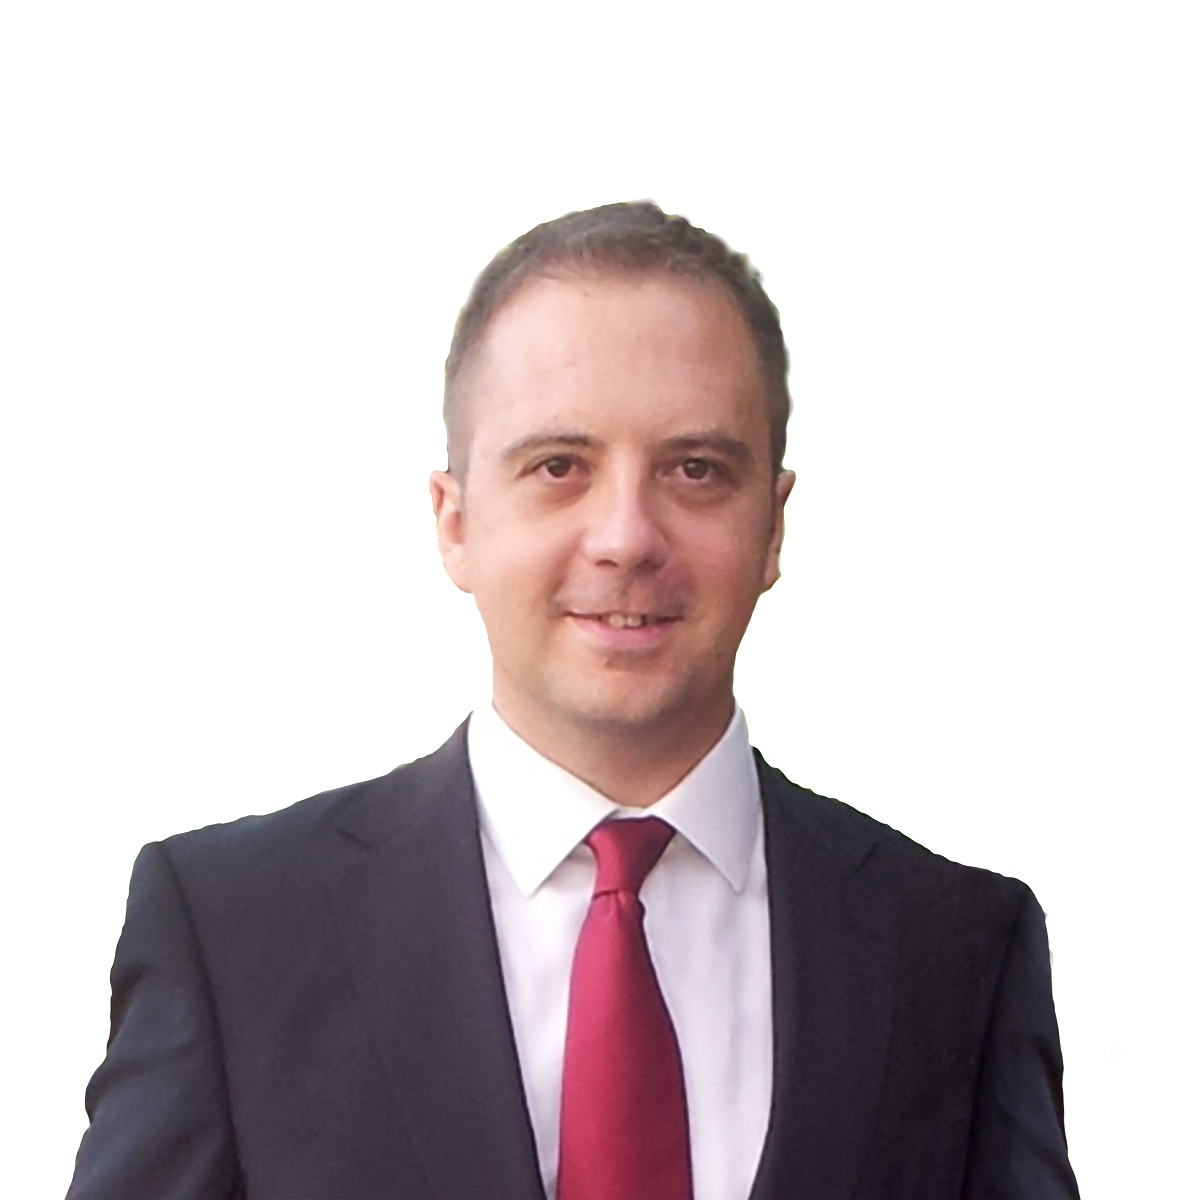 Raúl Hernández Luque